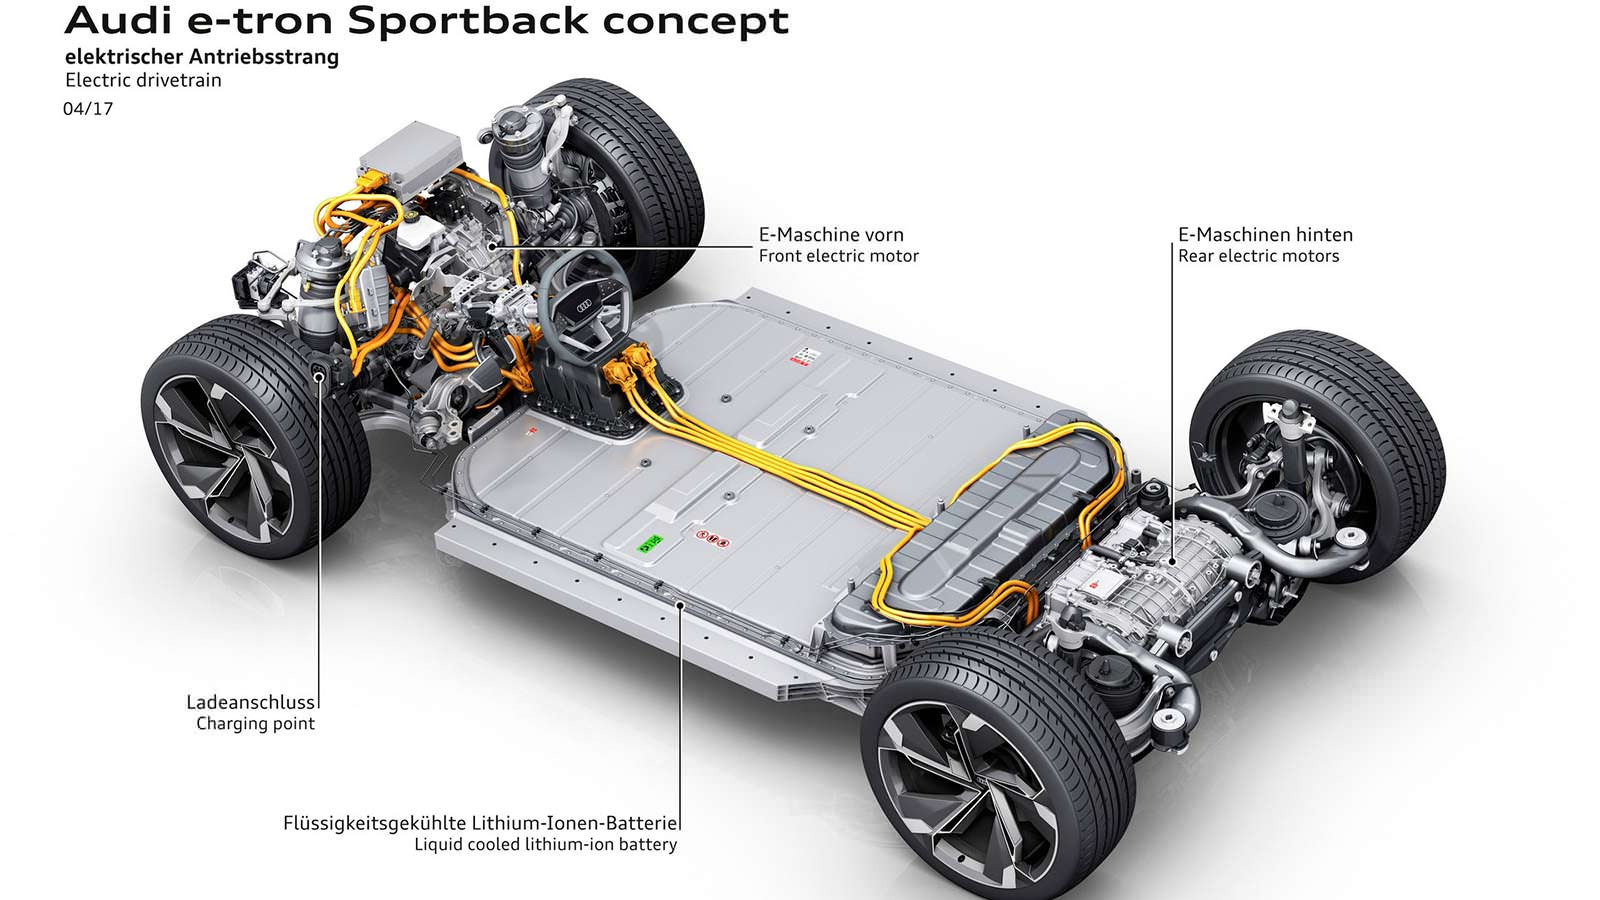 Audi E-Tron Sportback Concept: литий-ионная батарея в полу